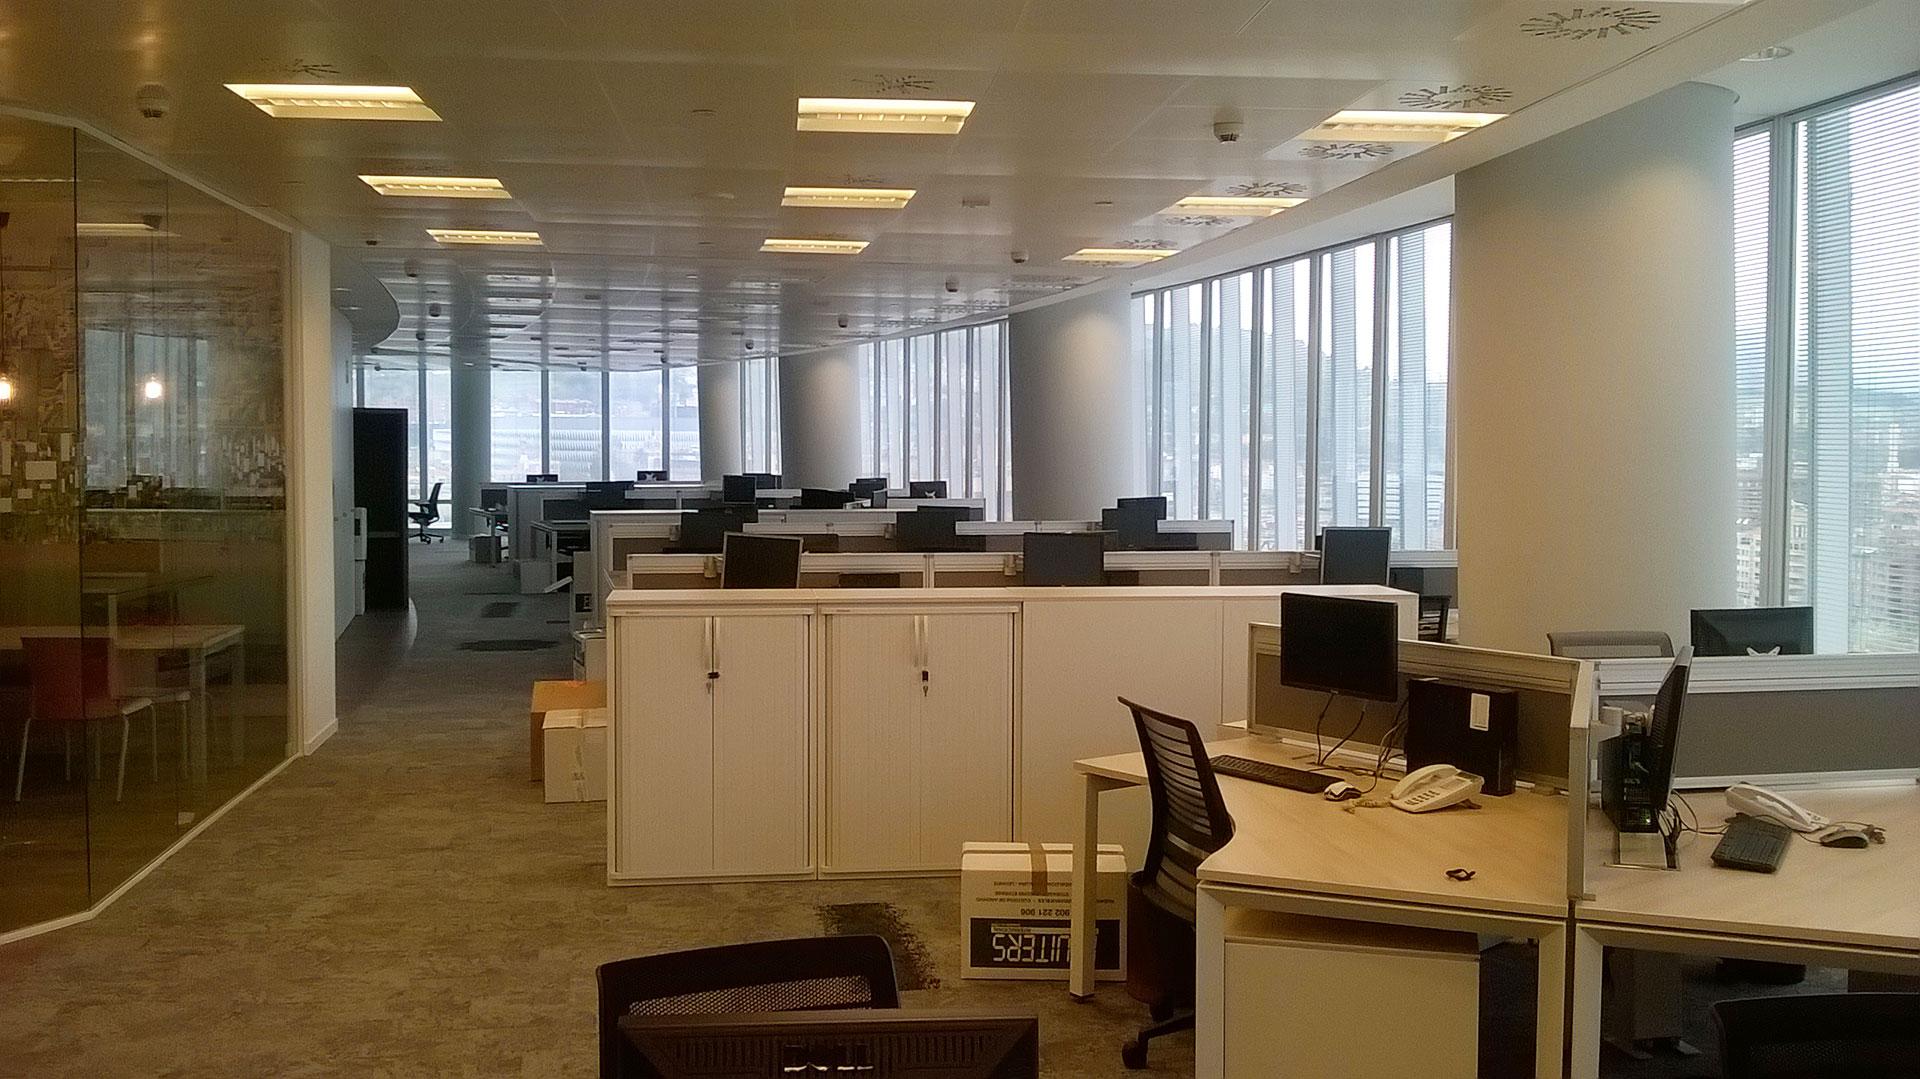 Oficinas de iberdrola en bilbao latest torre iberdrola with oficinas de iberdrola en bilbao - Oficinas de iberdrola en bilbao ...